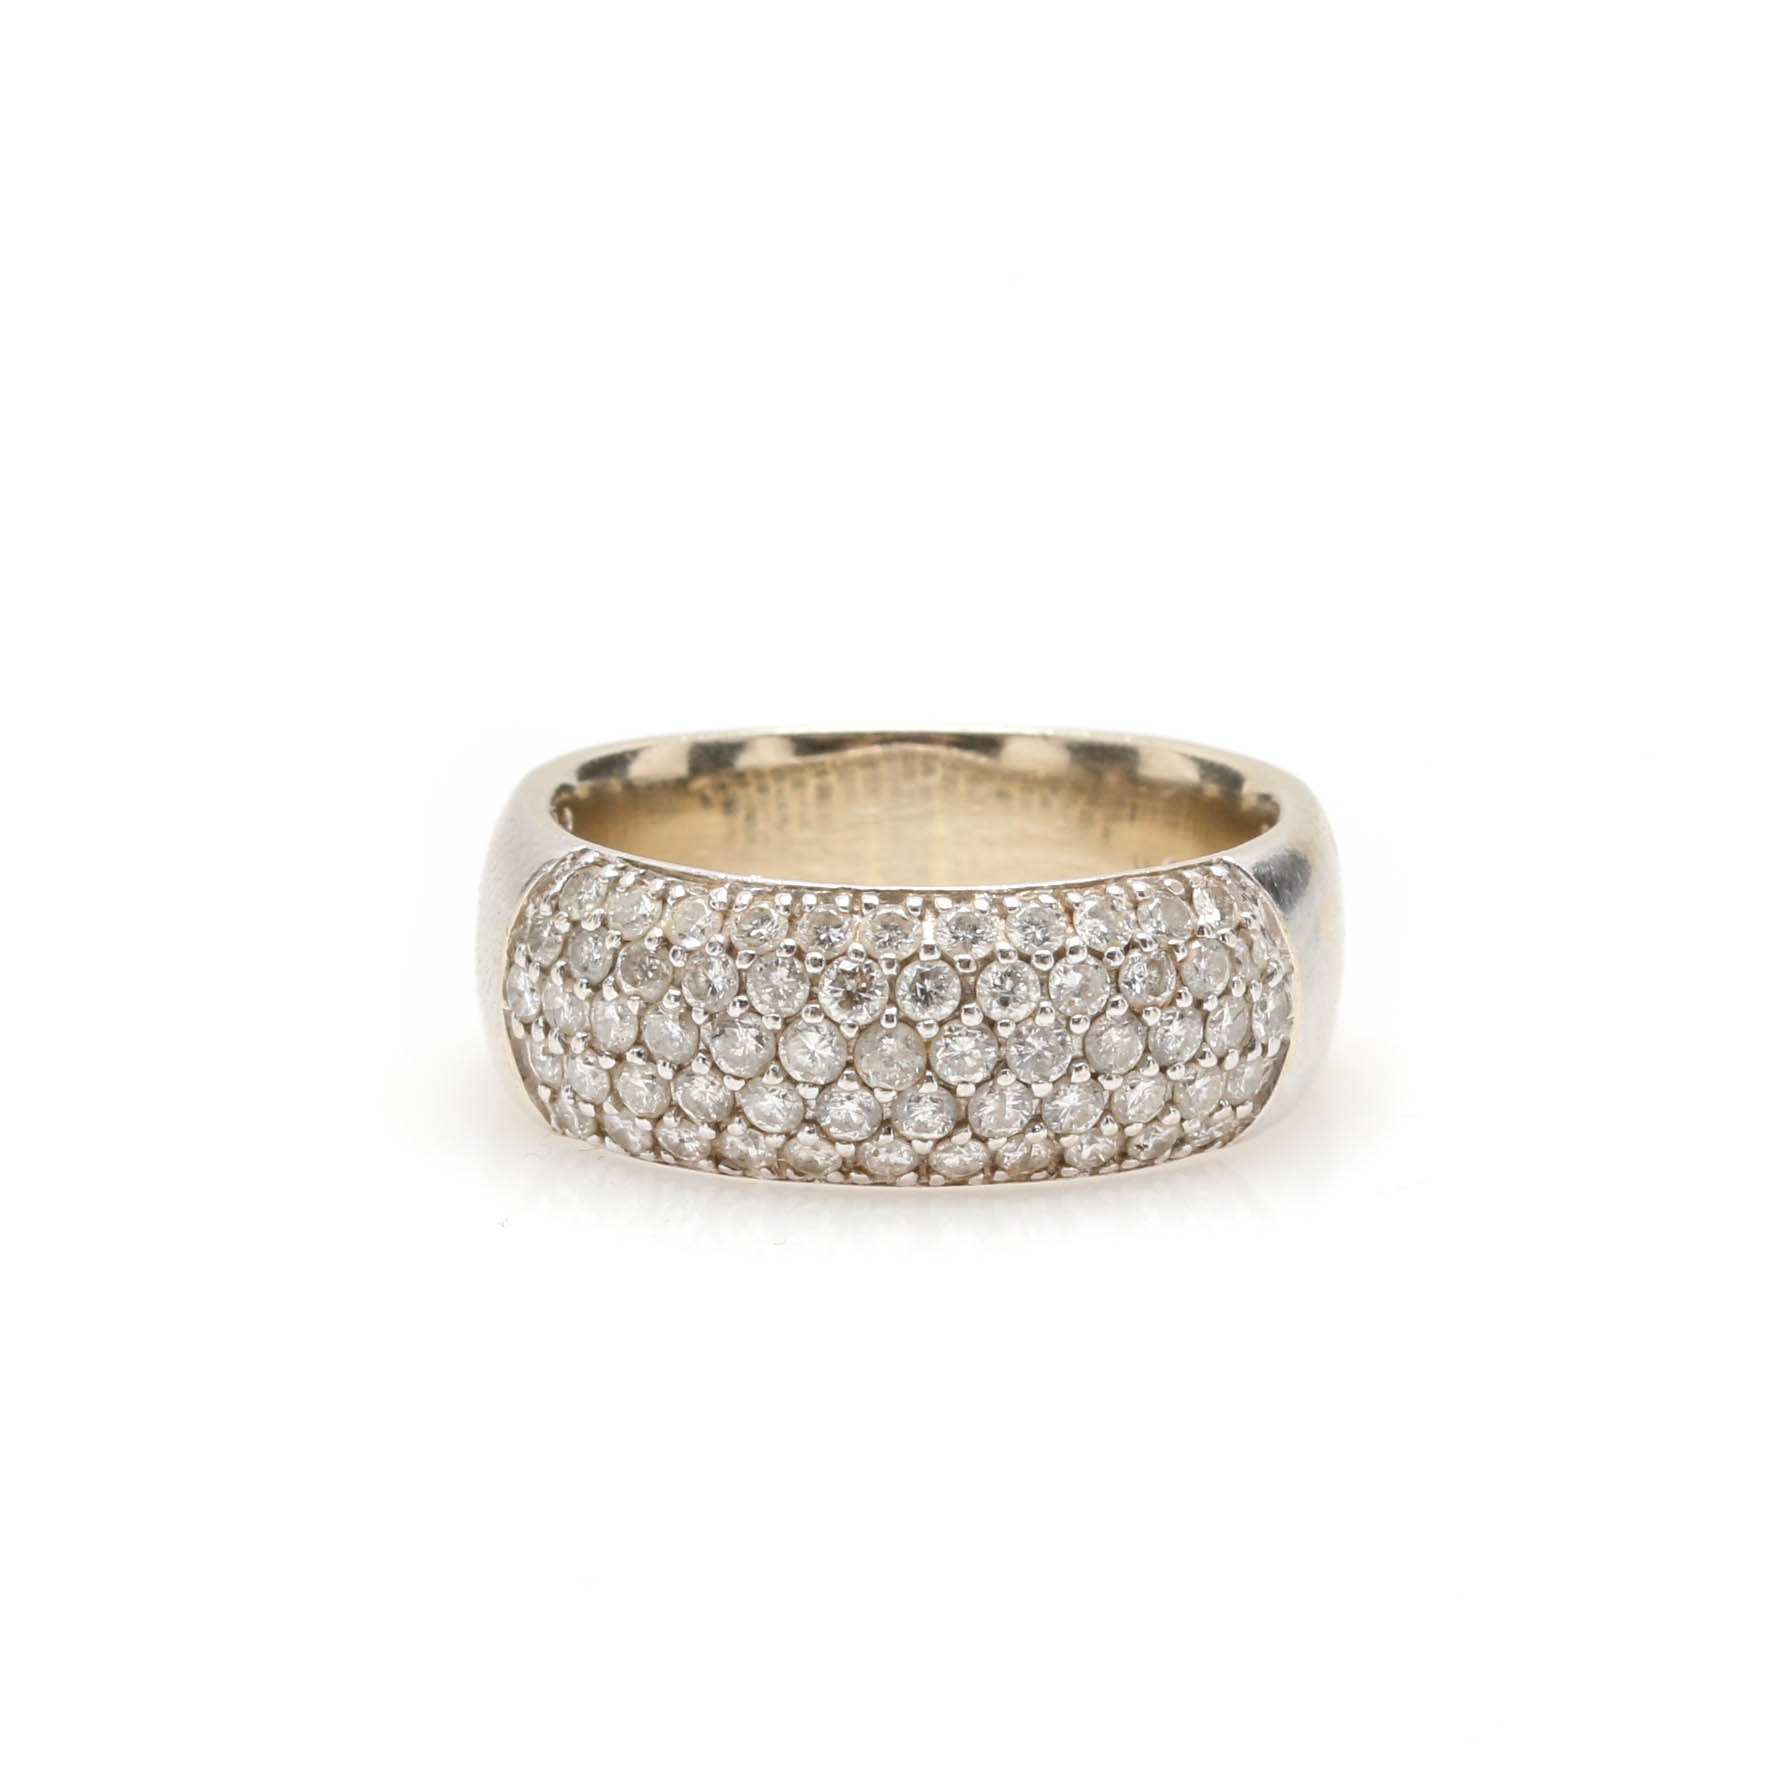 14K White Gold 1.05 CTW Diamond Ring Band